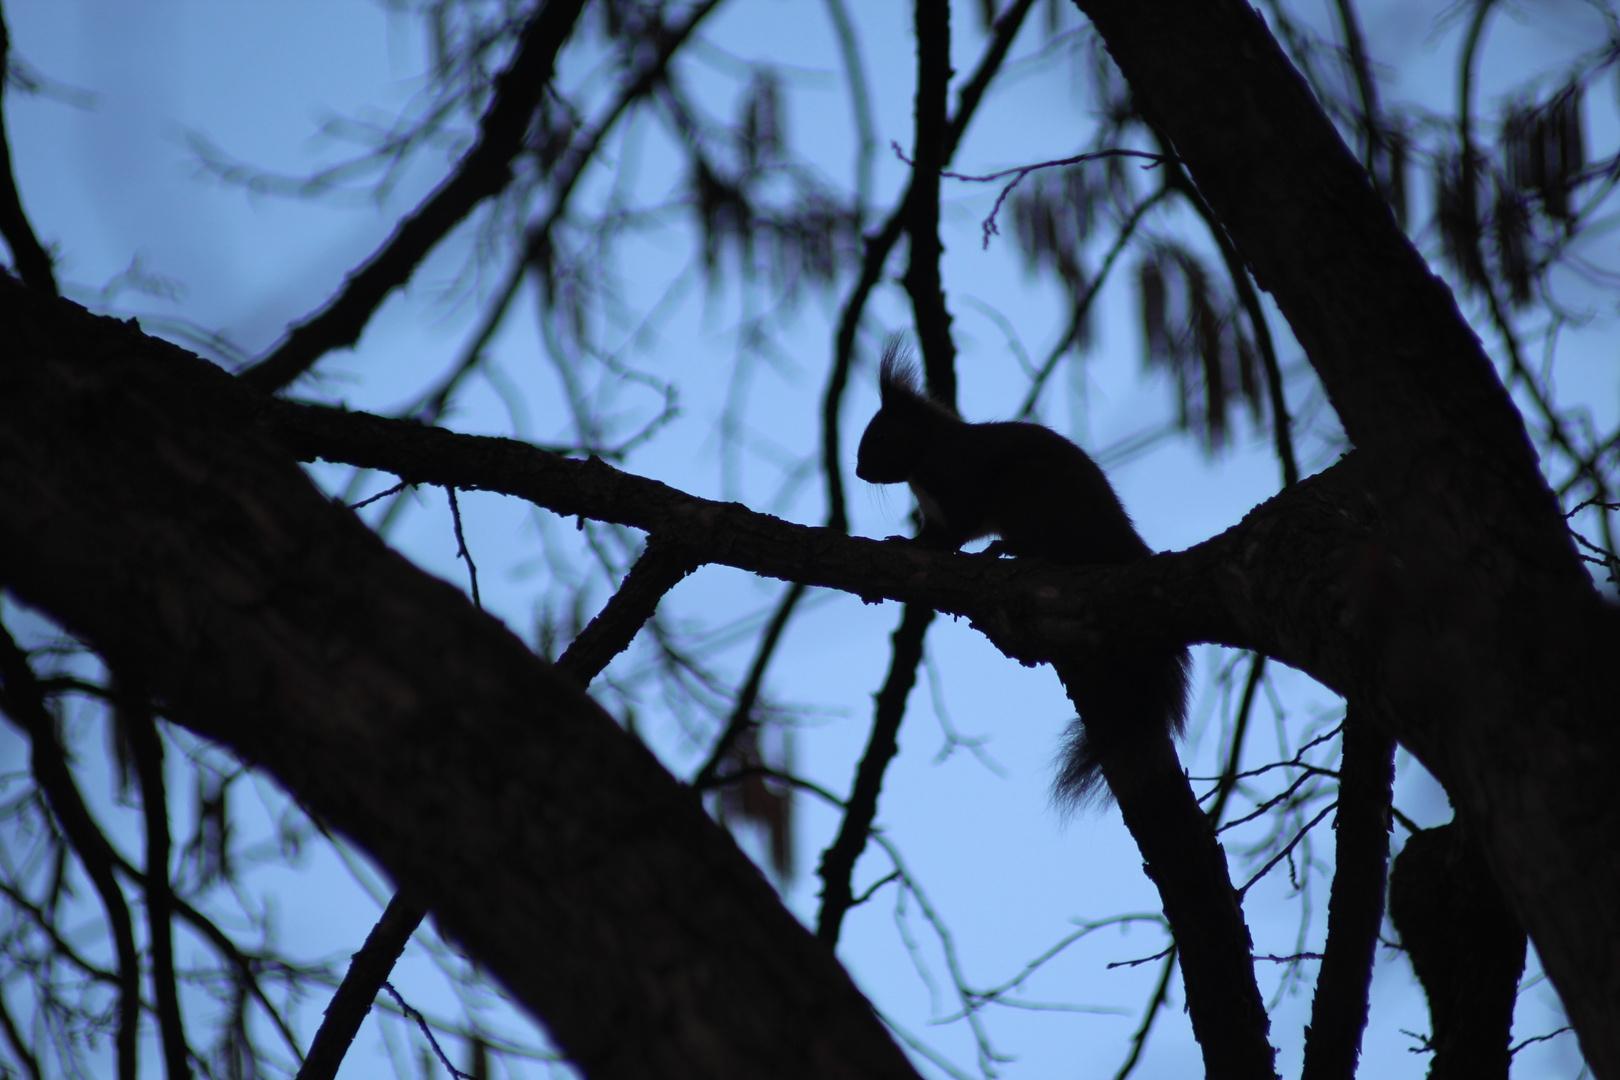 Hörnchensilhouette